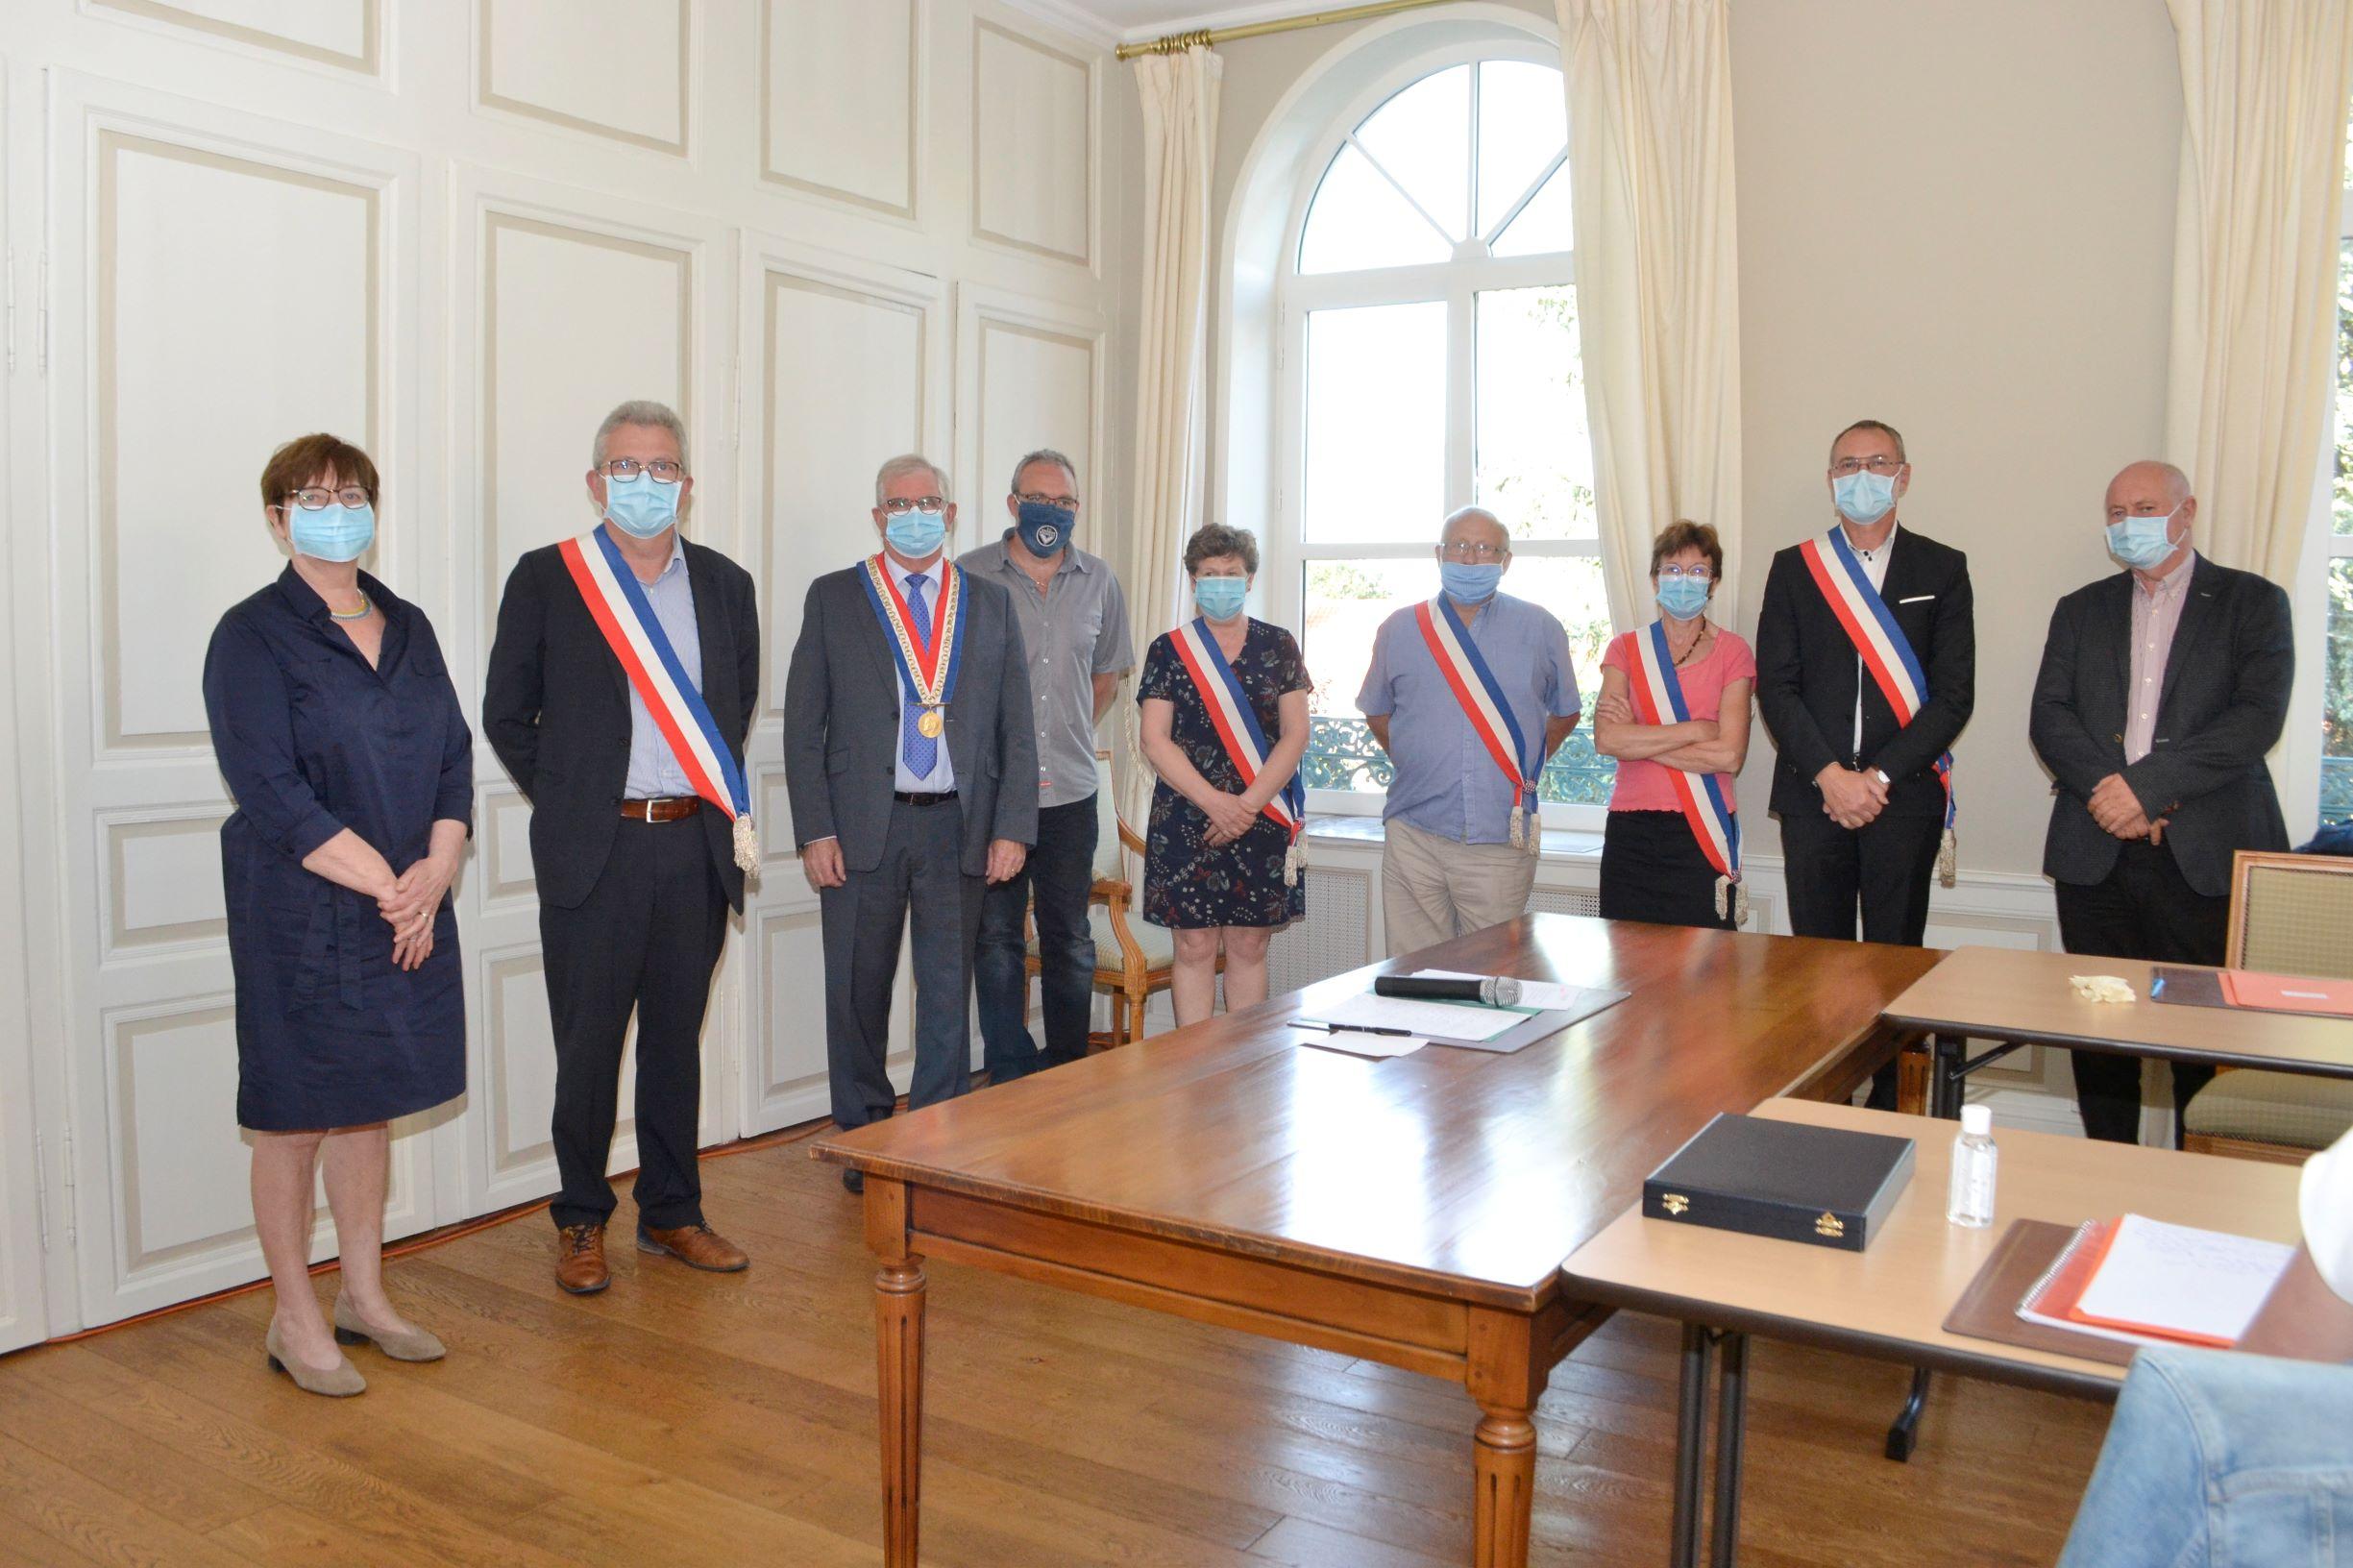 MaireAdjointsDeleguesMasques_2020.jpg